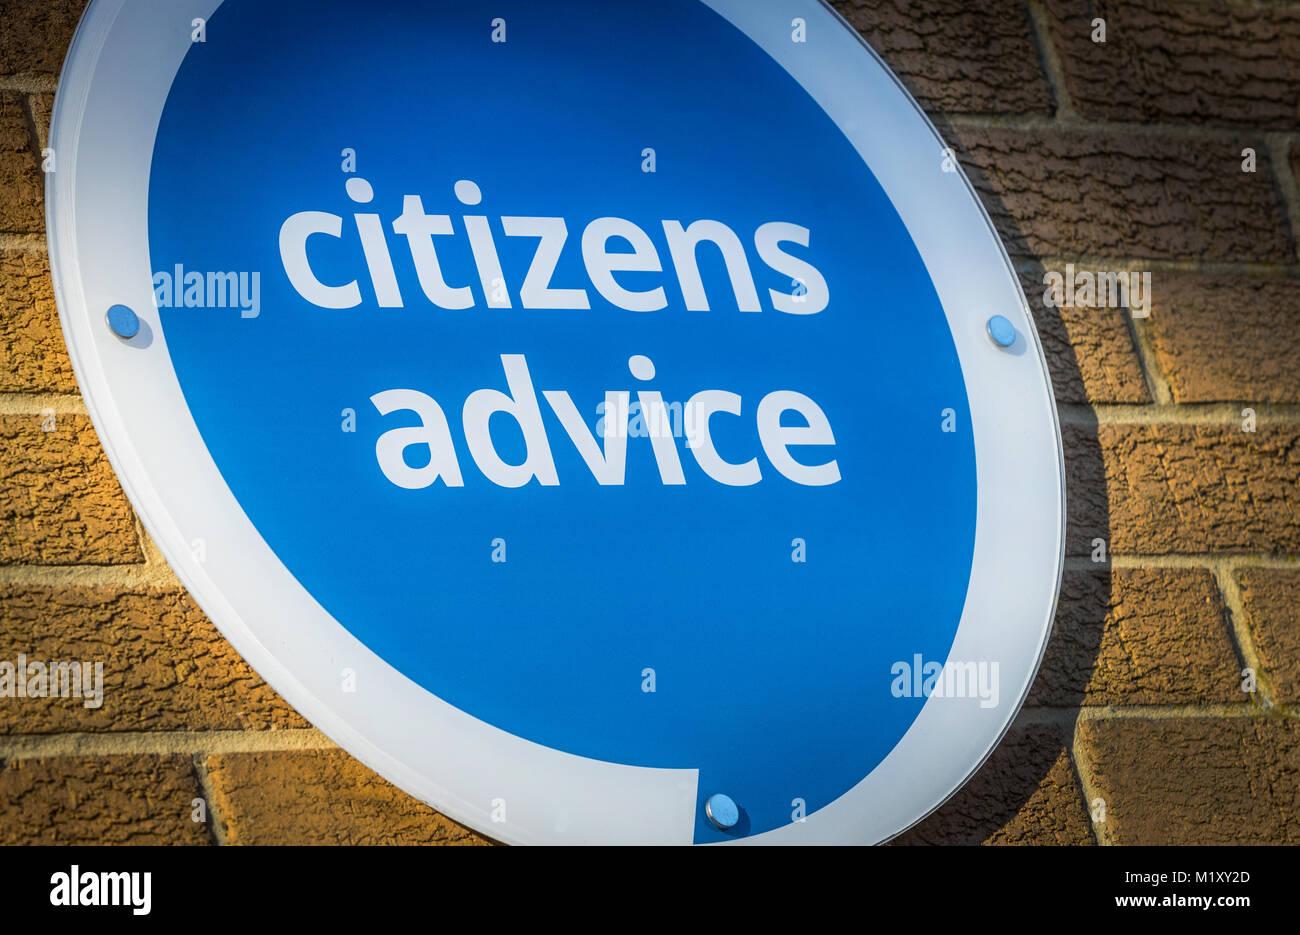 Citizens Advice Center in Großbritannien Stockbild